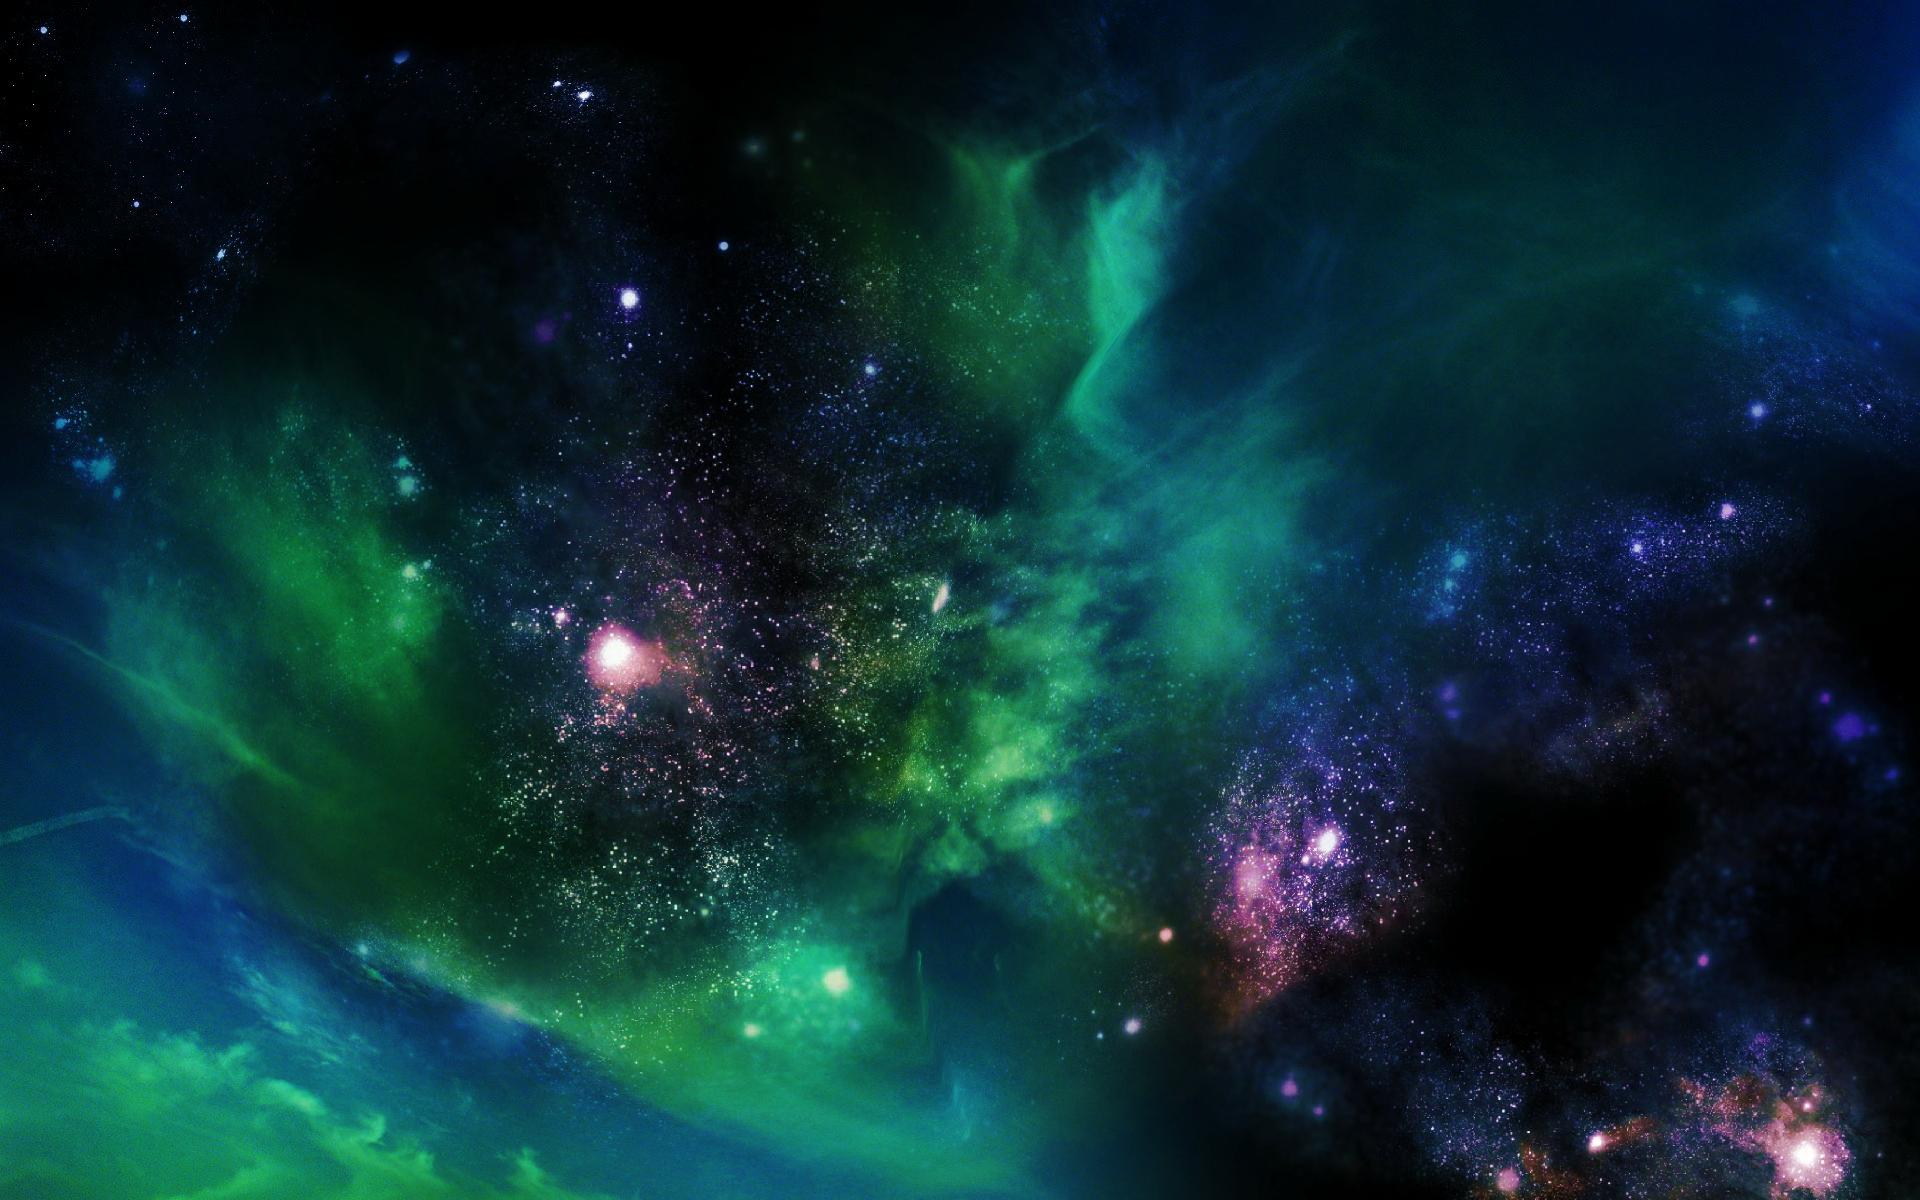 Free Download Accueil Espace Fonds Dcran Hd Color Cosmos Fond